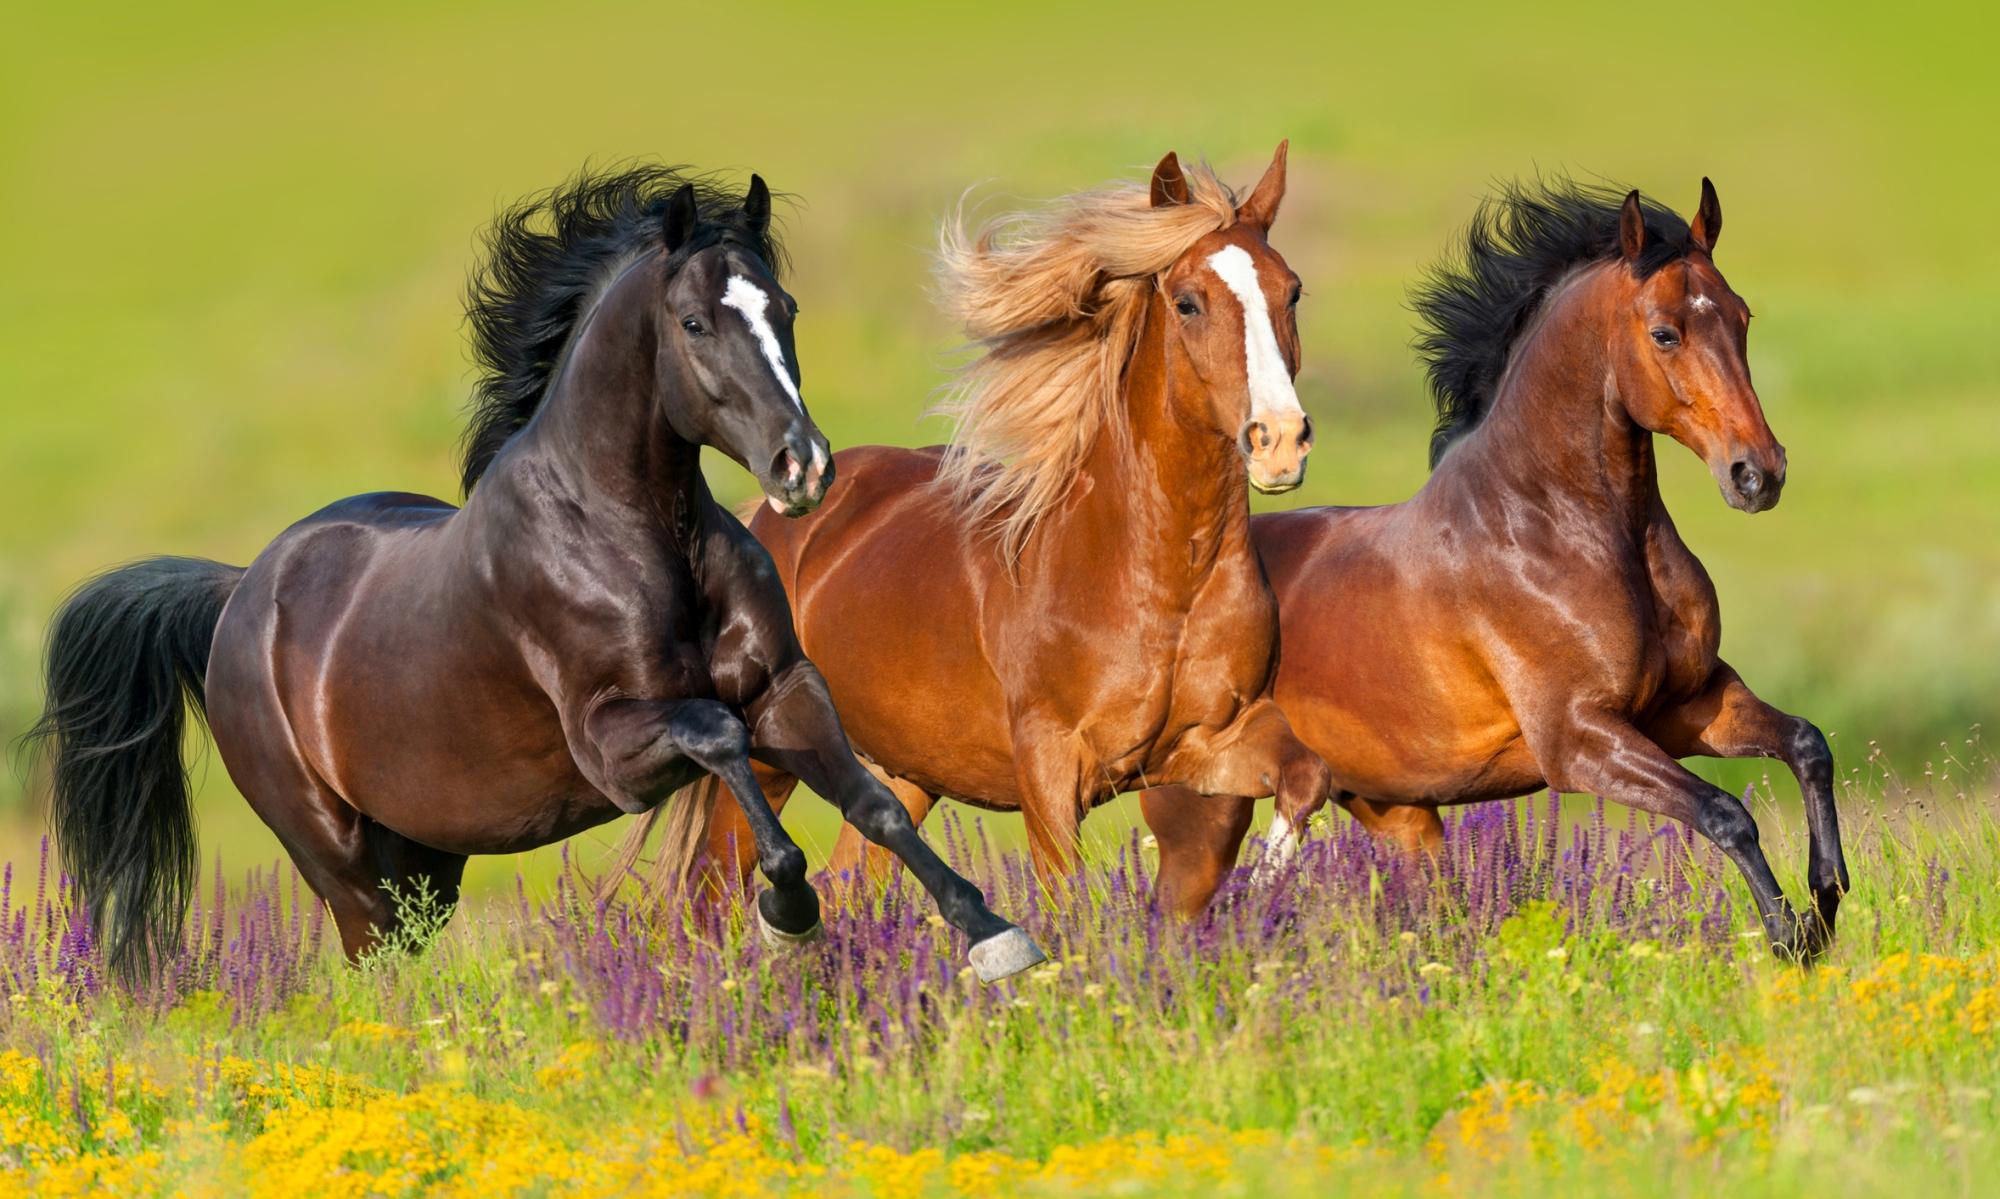 Pferdeklug der Pferdeblog